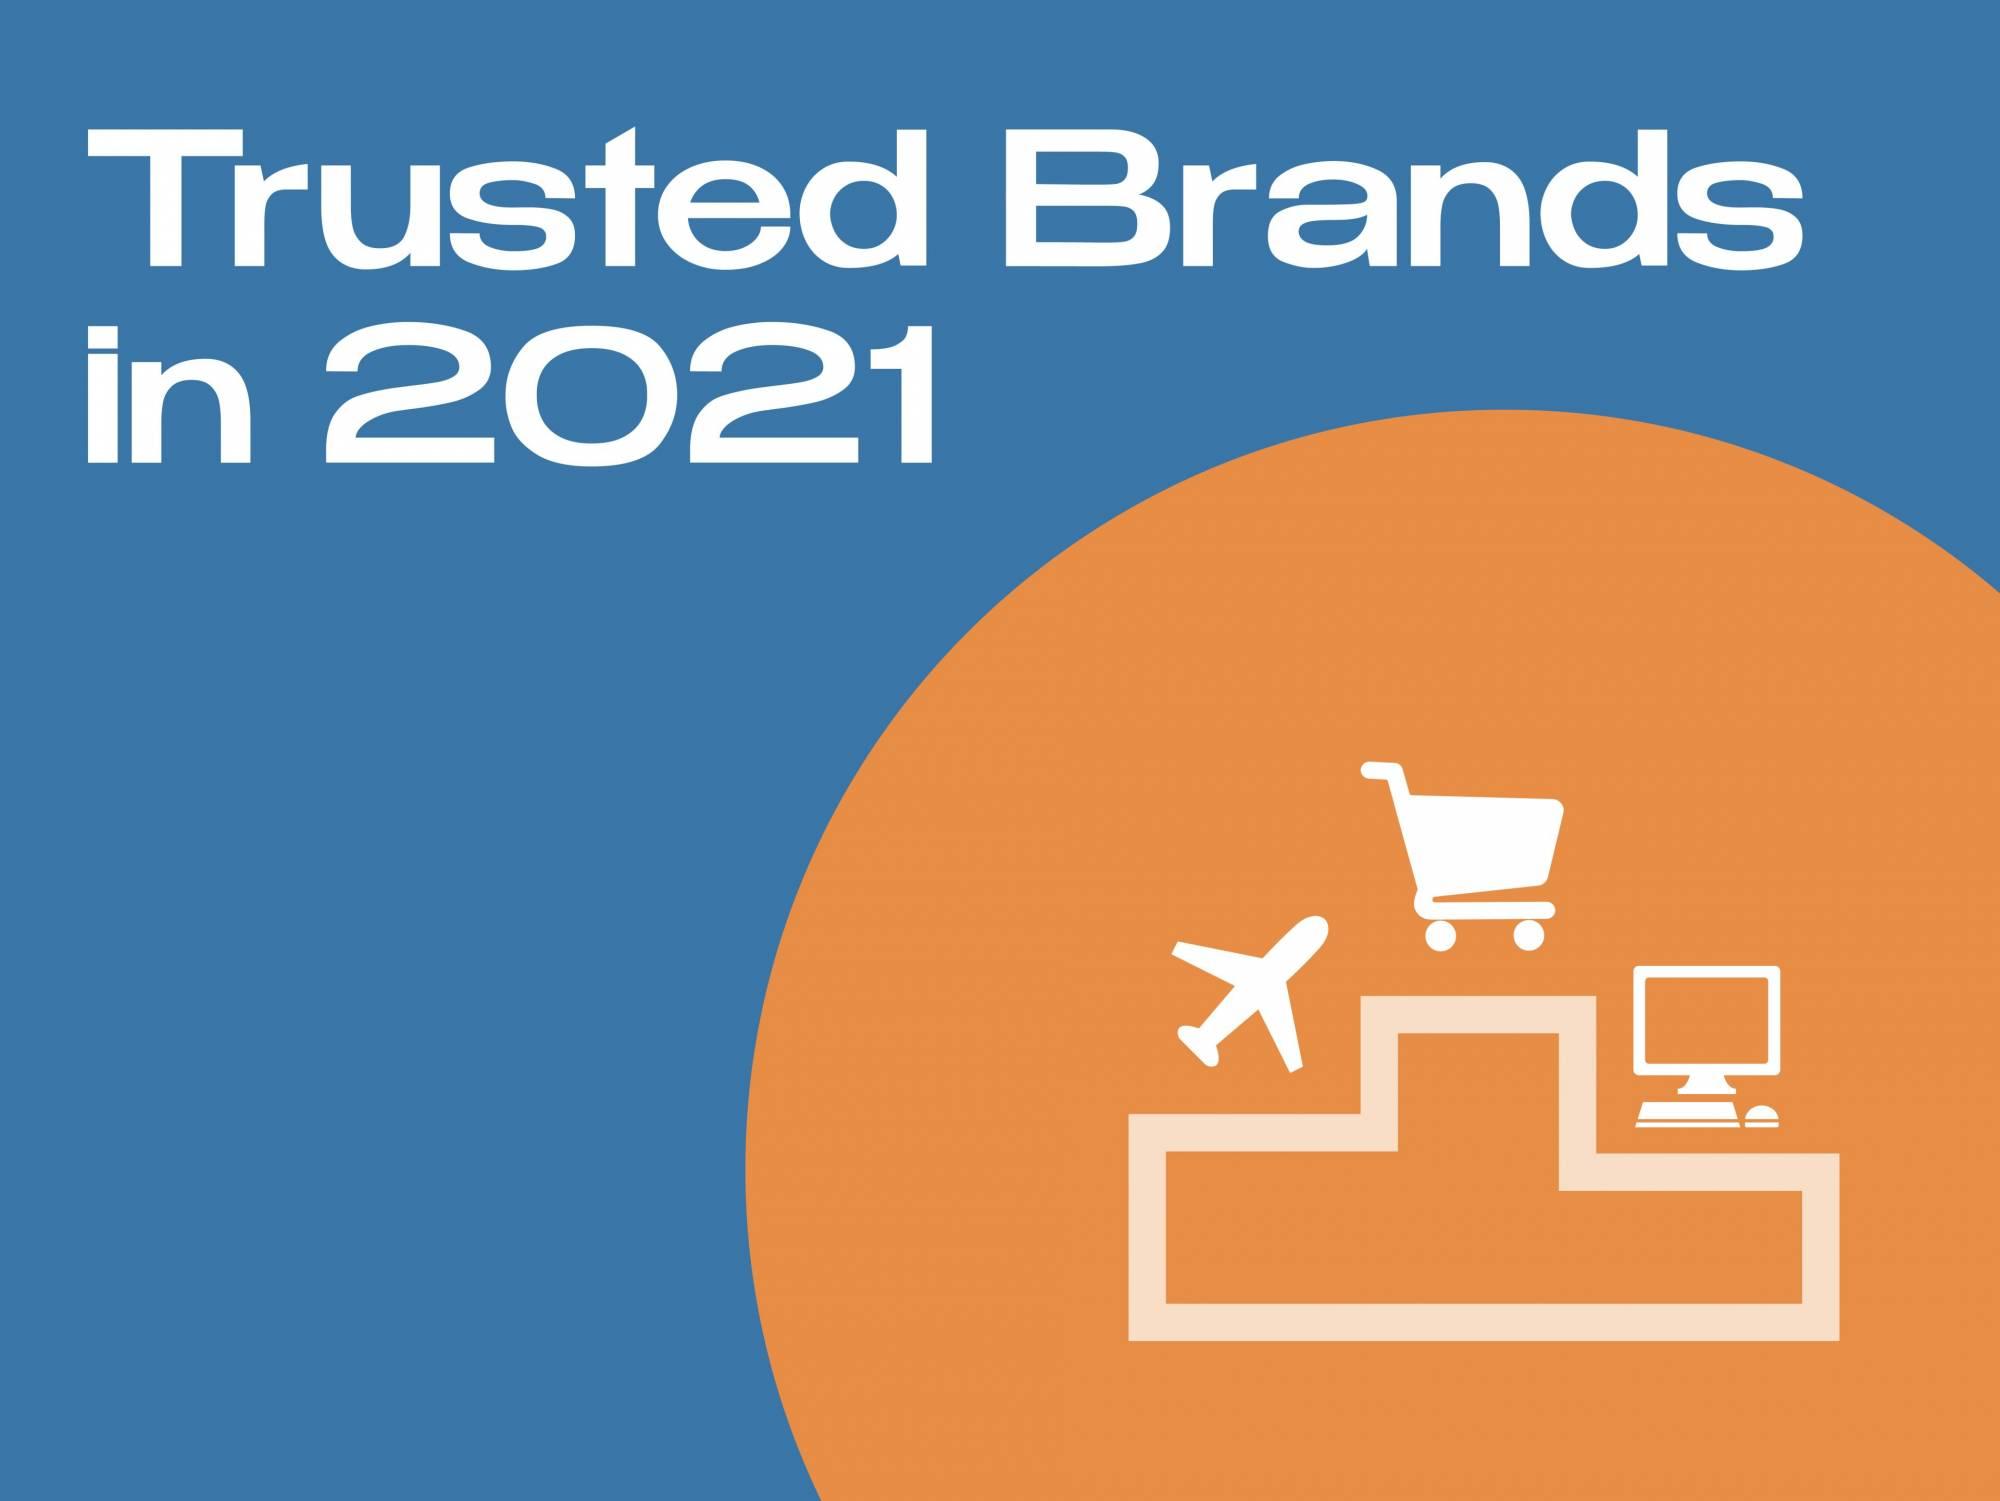 Trusted Brands in 2021 by DAIS branding agency Brisbane